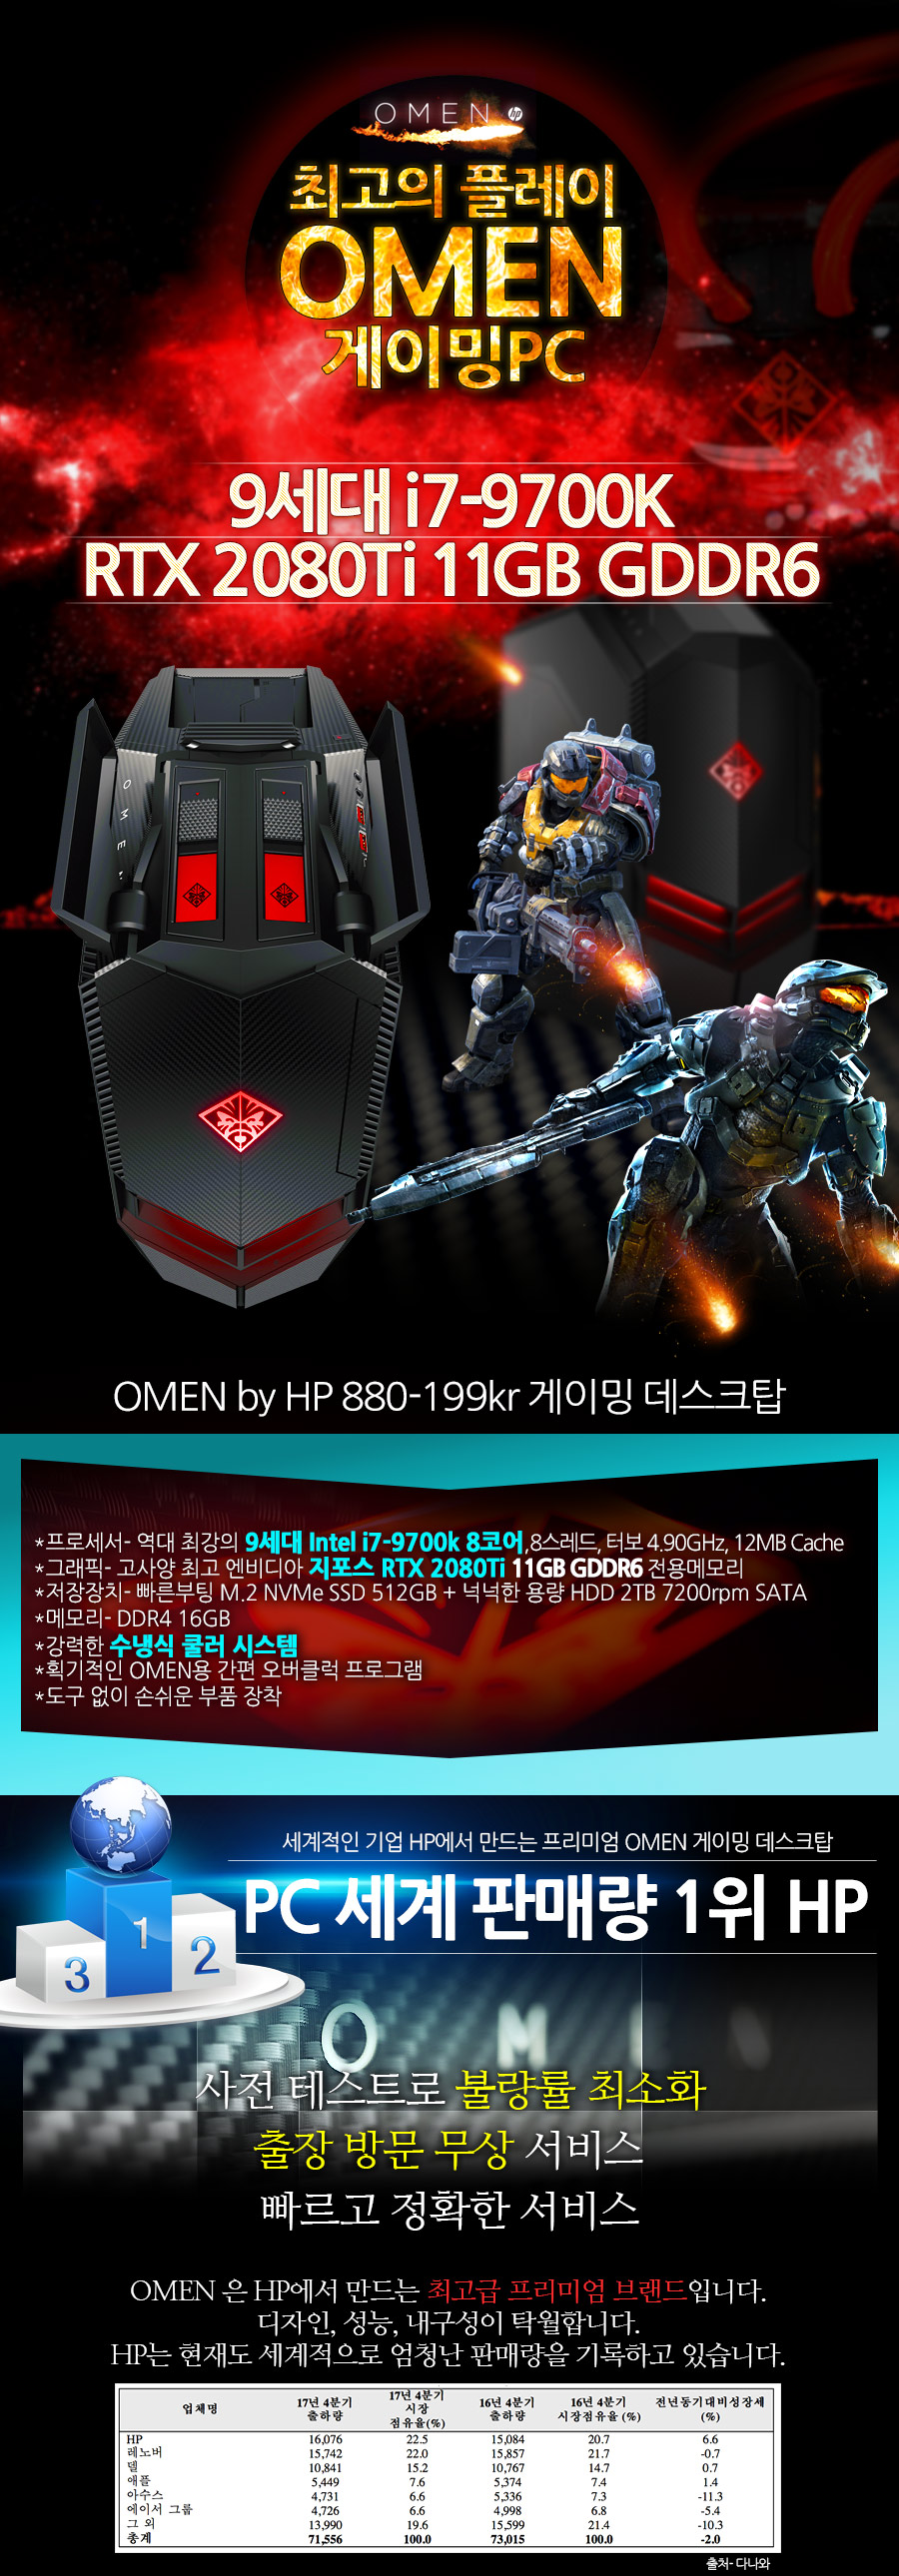 Hp OMEN 880-199 Kr Gaming Desktops PC/RTX 2080 Ti 9thgeneration i7